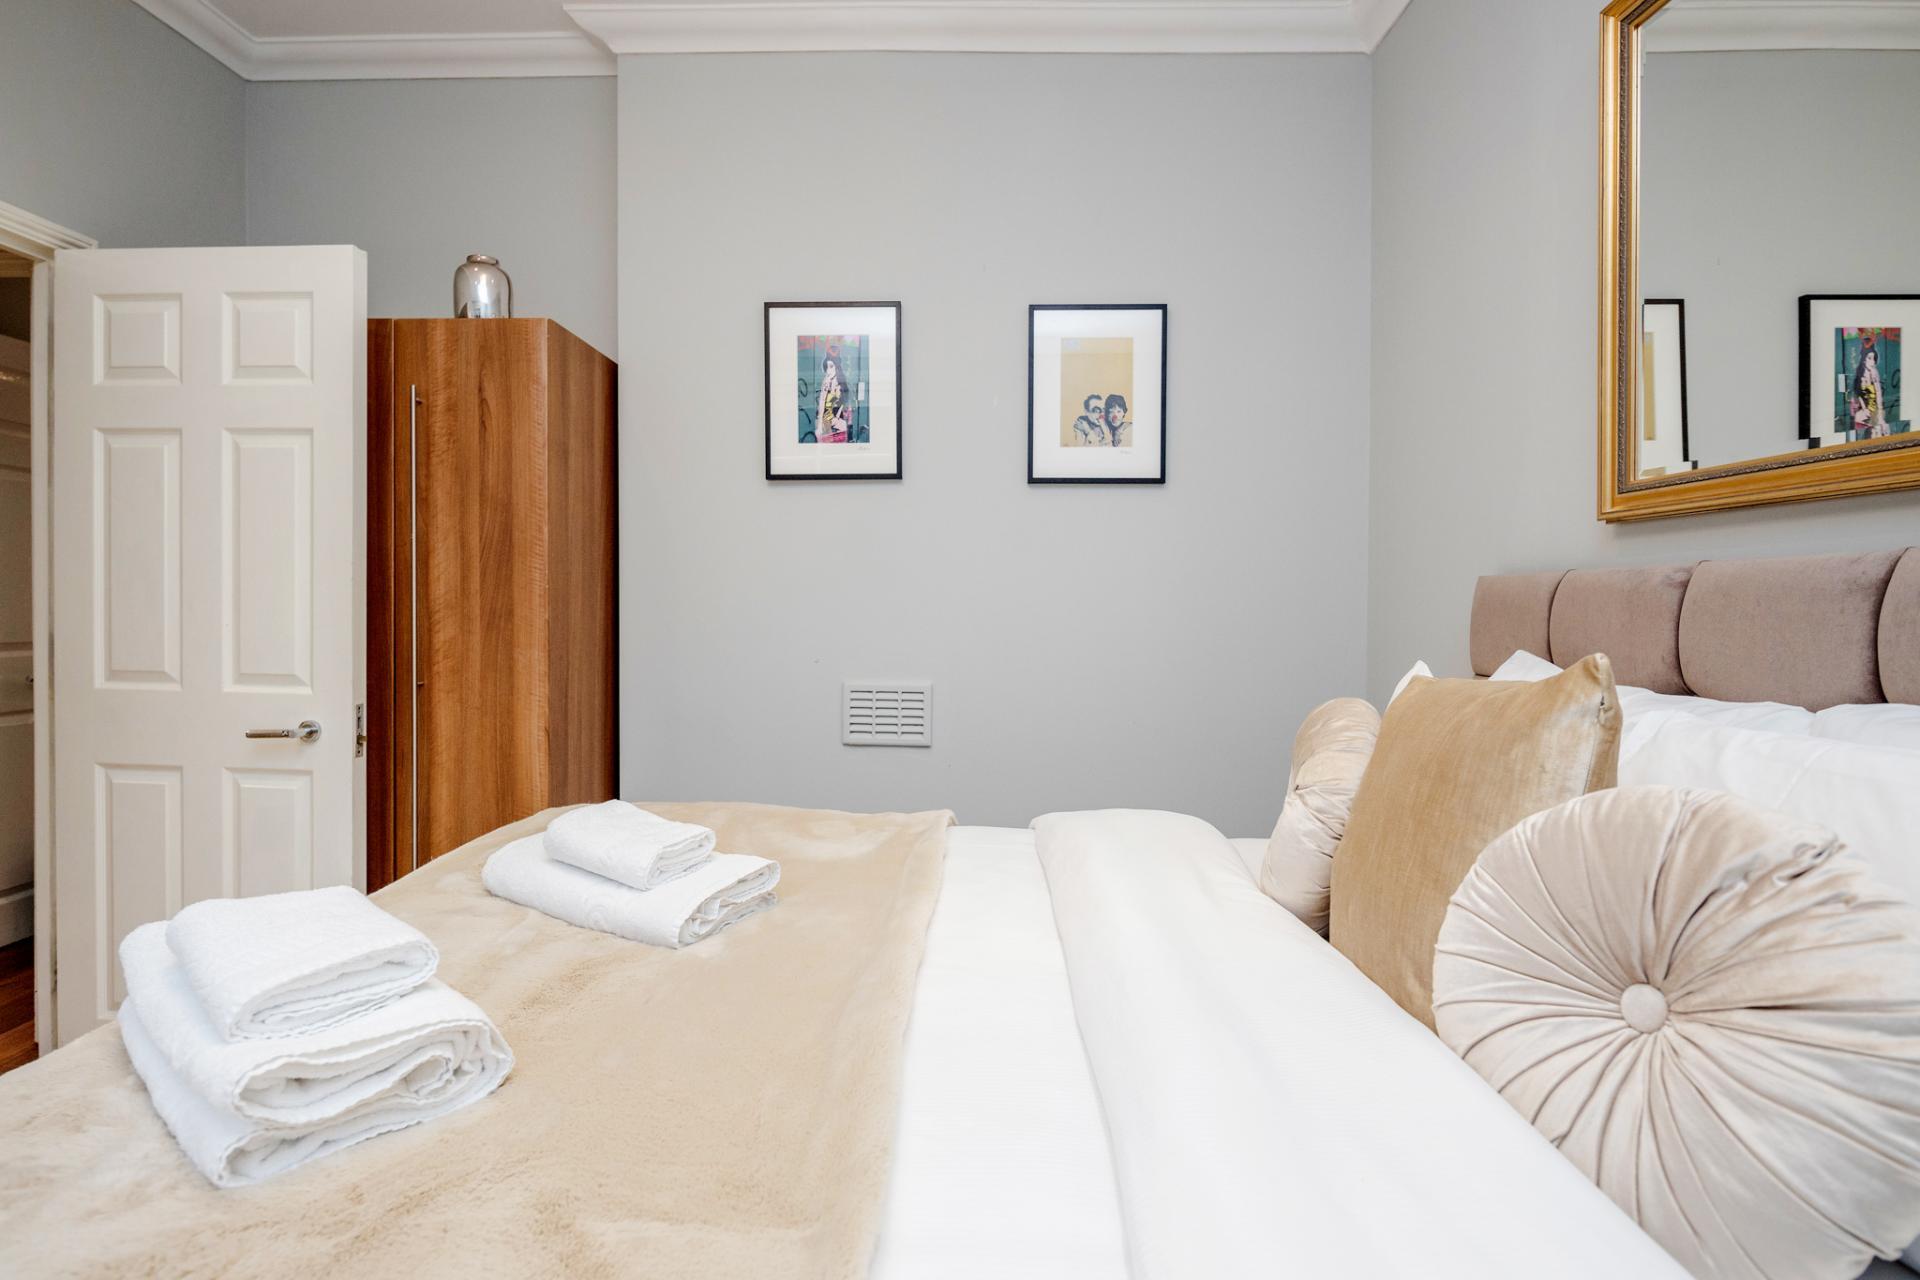 Cosy bed at Kensington High Street, Kensington, London - Citybase Apartments